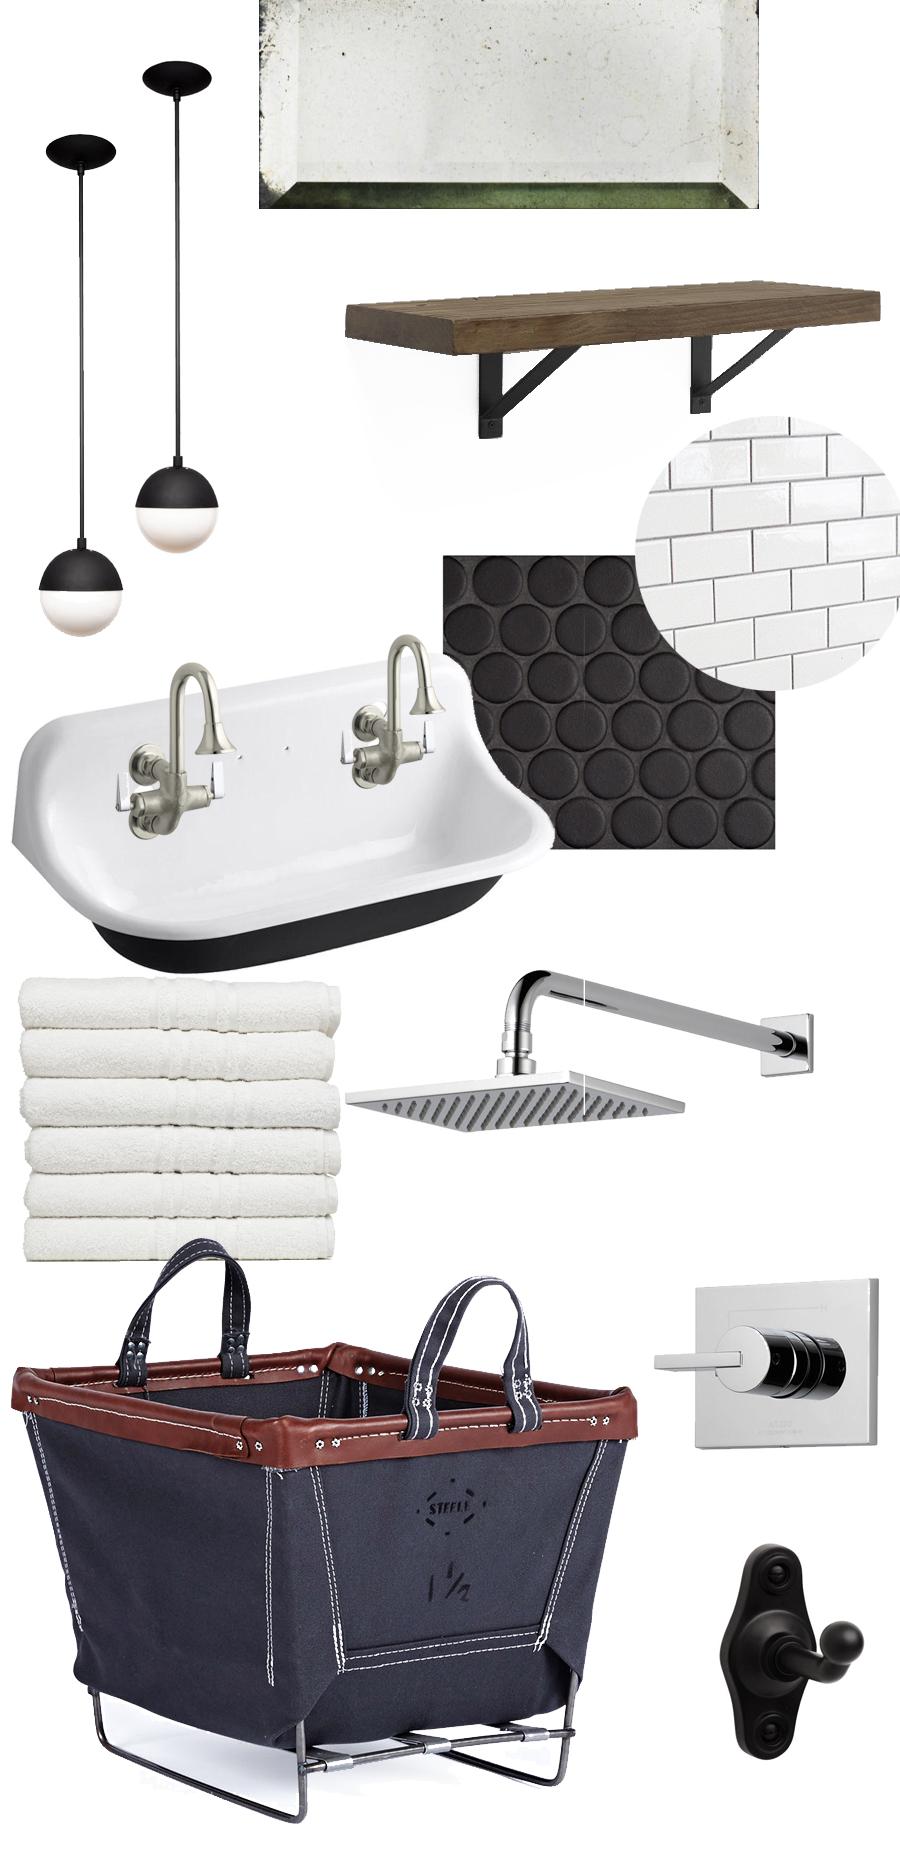 Creating a vintage/modern/industrial bathroom